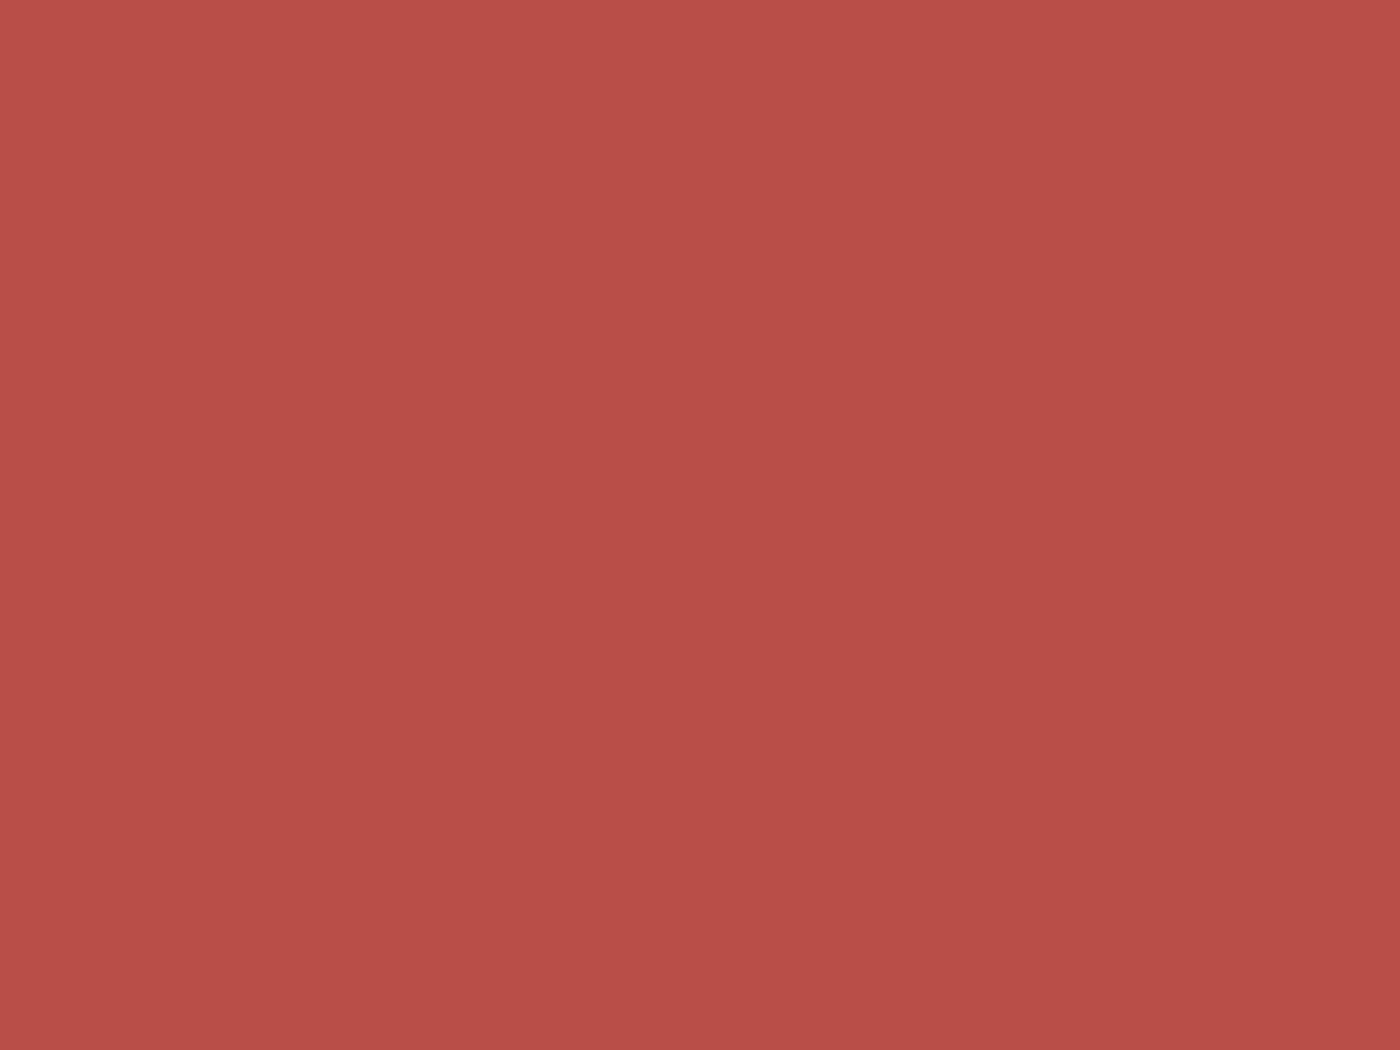 1400x1050 Deep Chestnut Solid Color Background